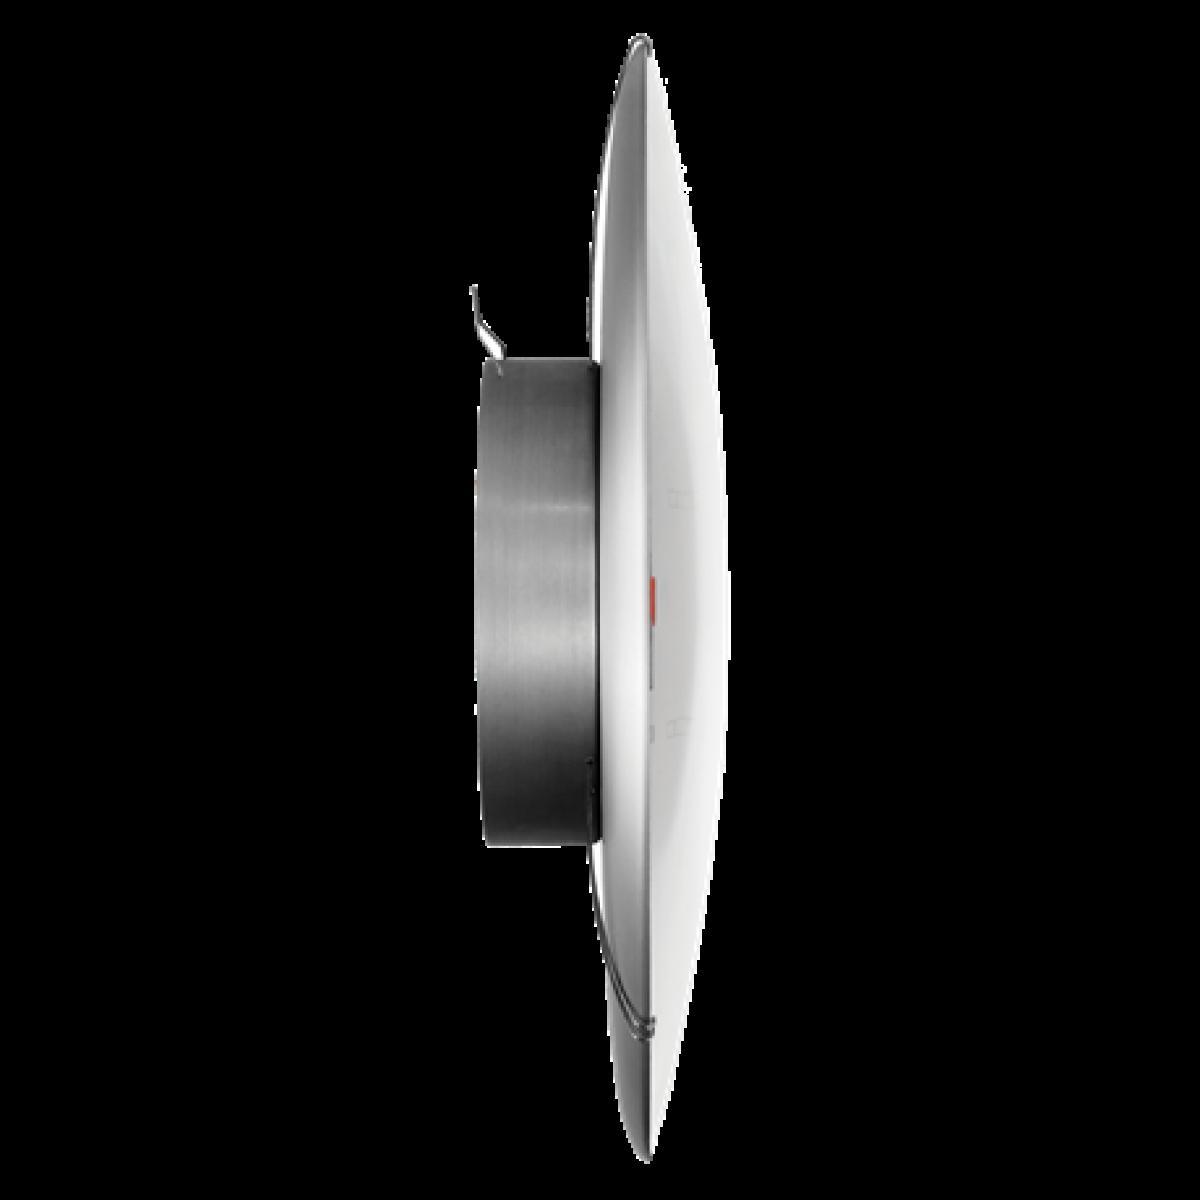 ARNEJACOBSENBankersvgur48cm-07